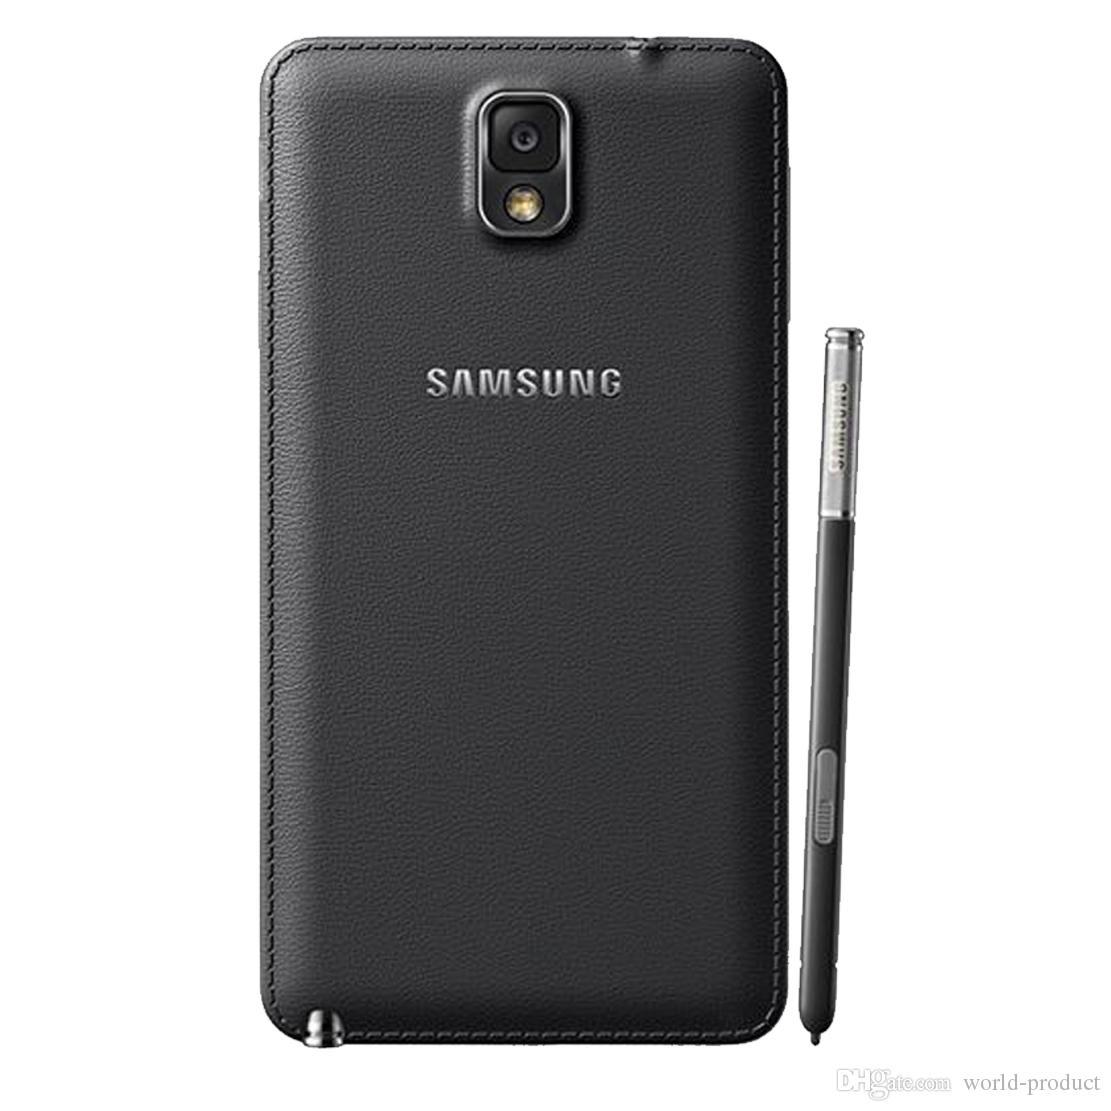 Refurbished Samsung Galaxy Note 3 N900A 5.7 inch Quad Core 3GB RAM 32GB ROM 13MP Quad Core Original Smartphone